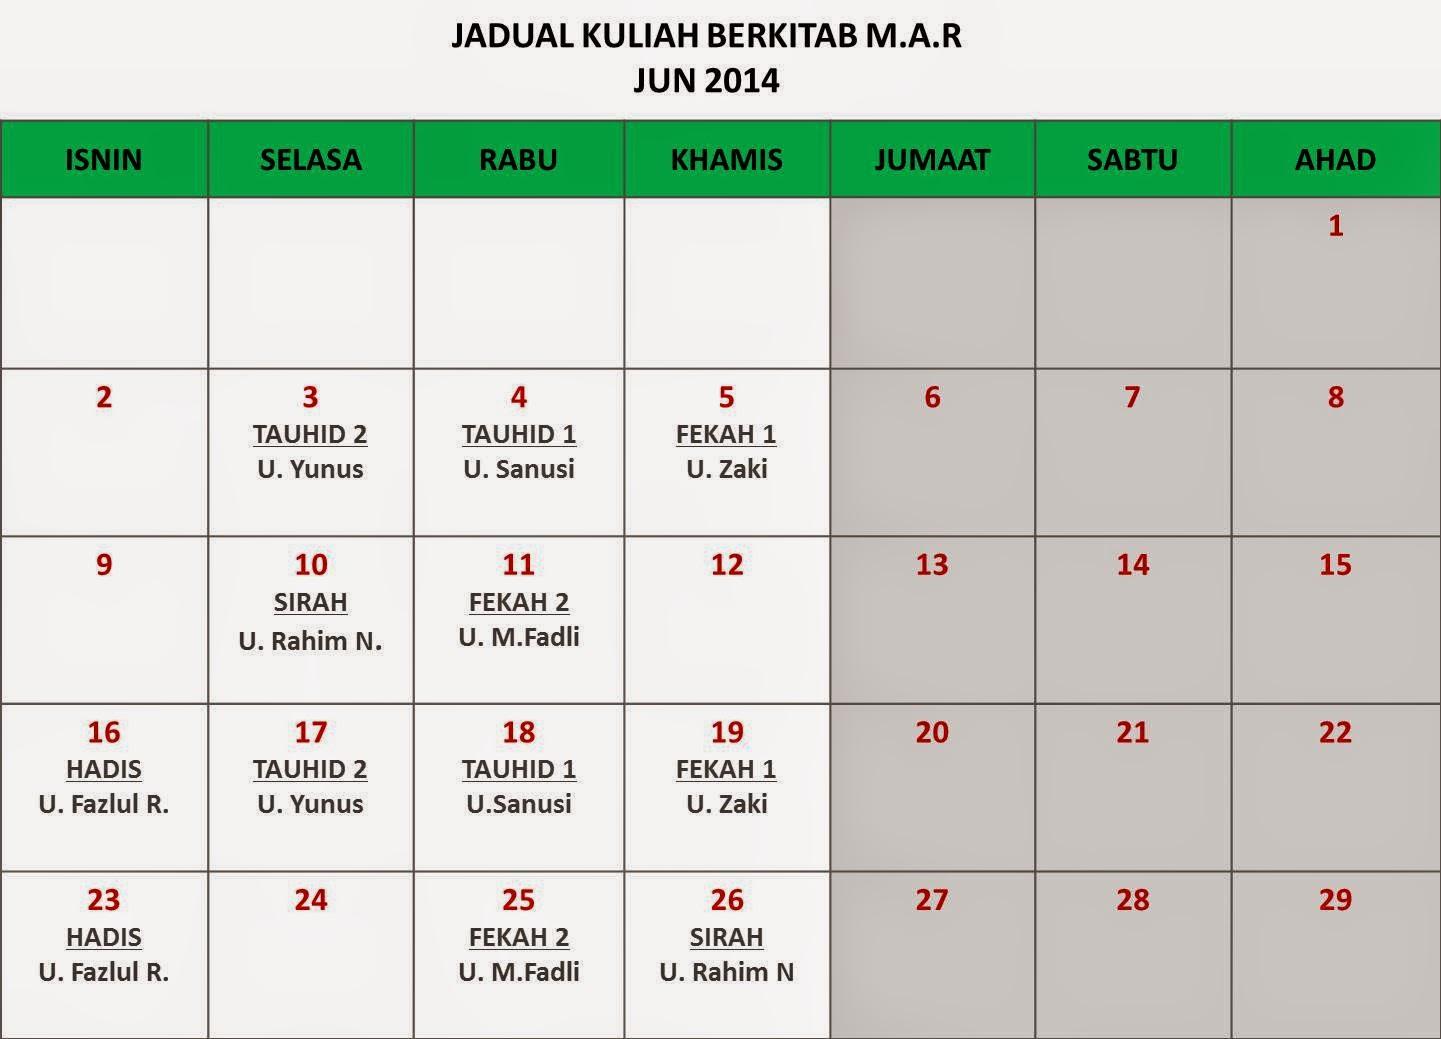 Jadual Bulan Jun